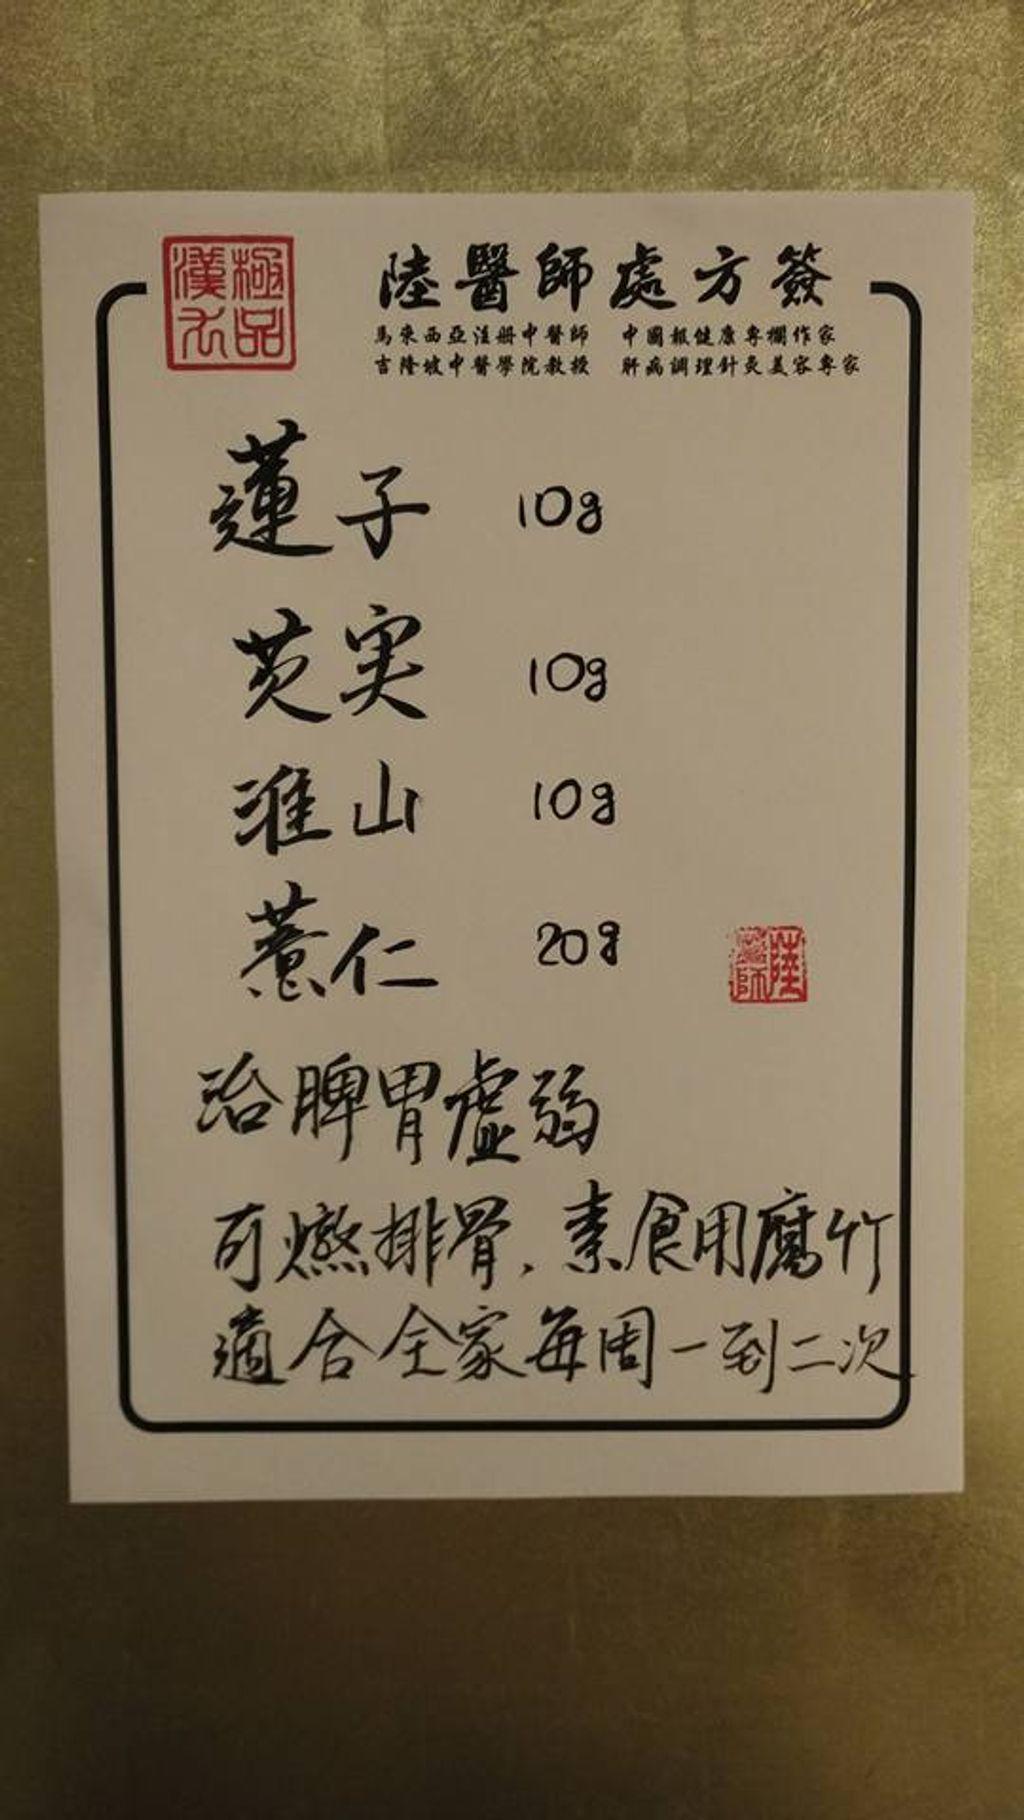 Recipe for Digestive Malfunction 【胃腸功能不良】